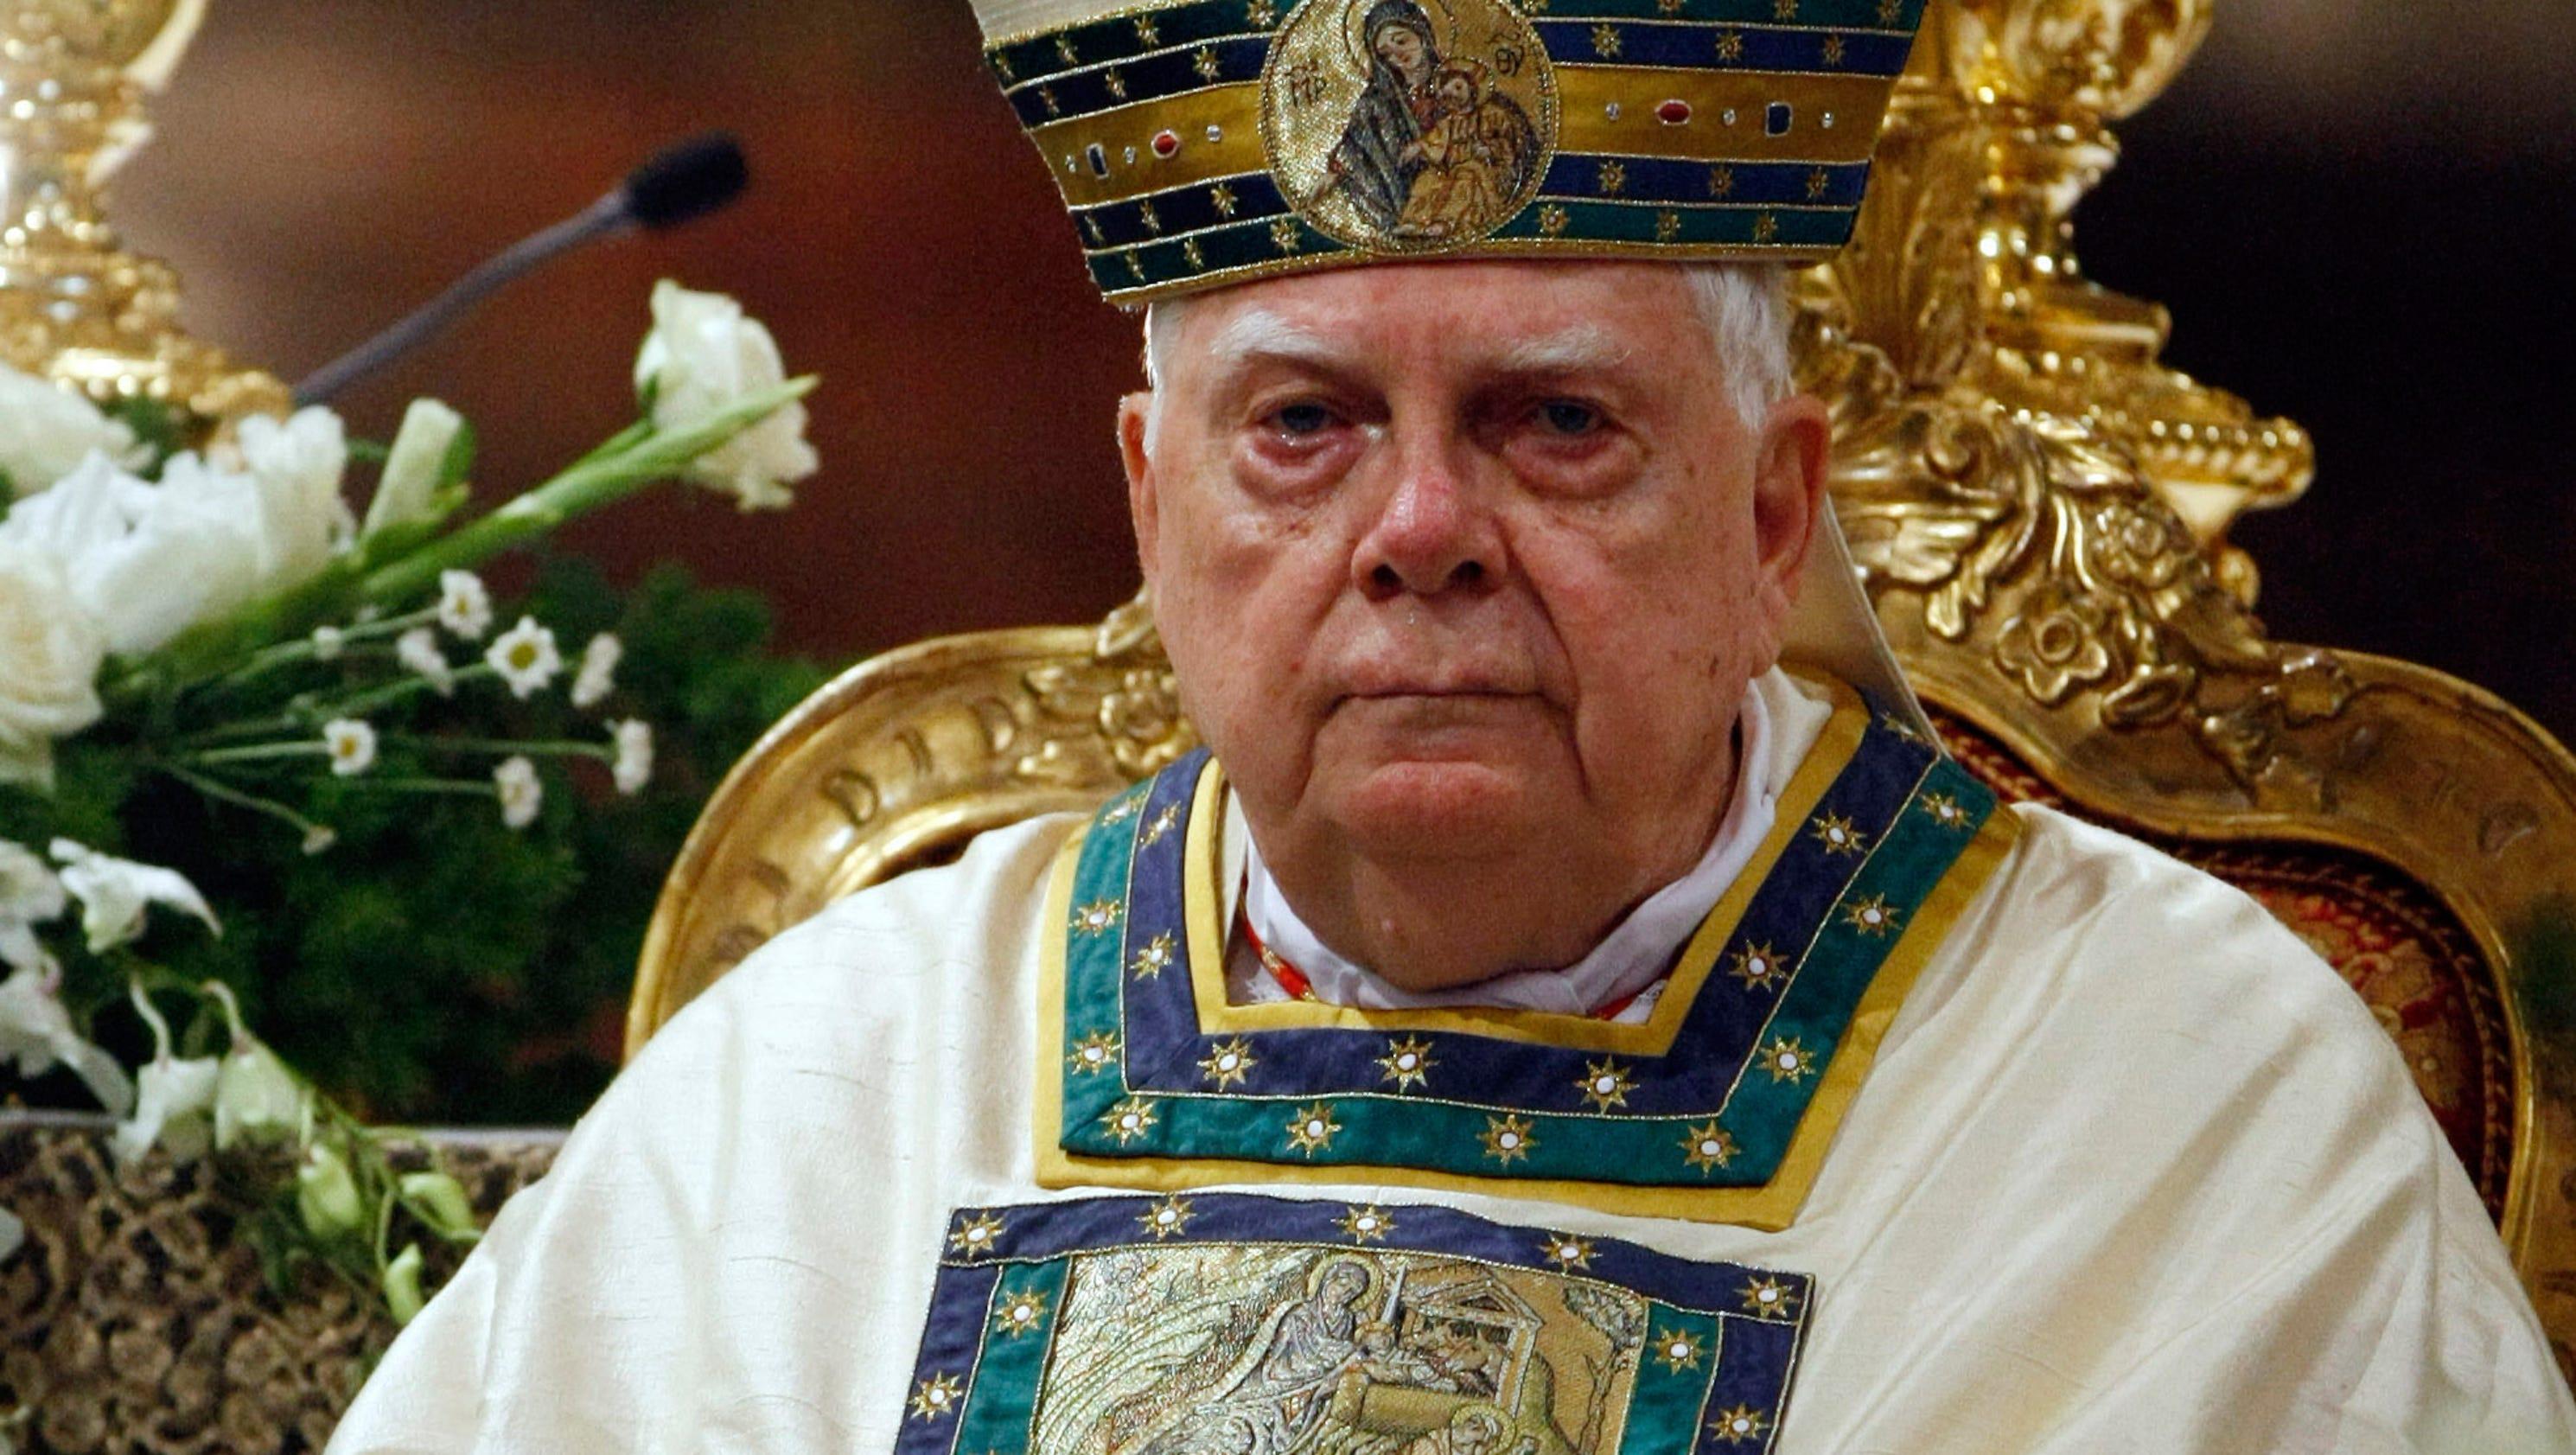 church bishop in sex scandal news in Launceston You